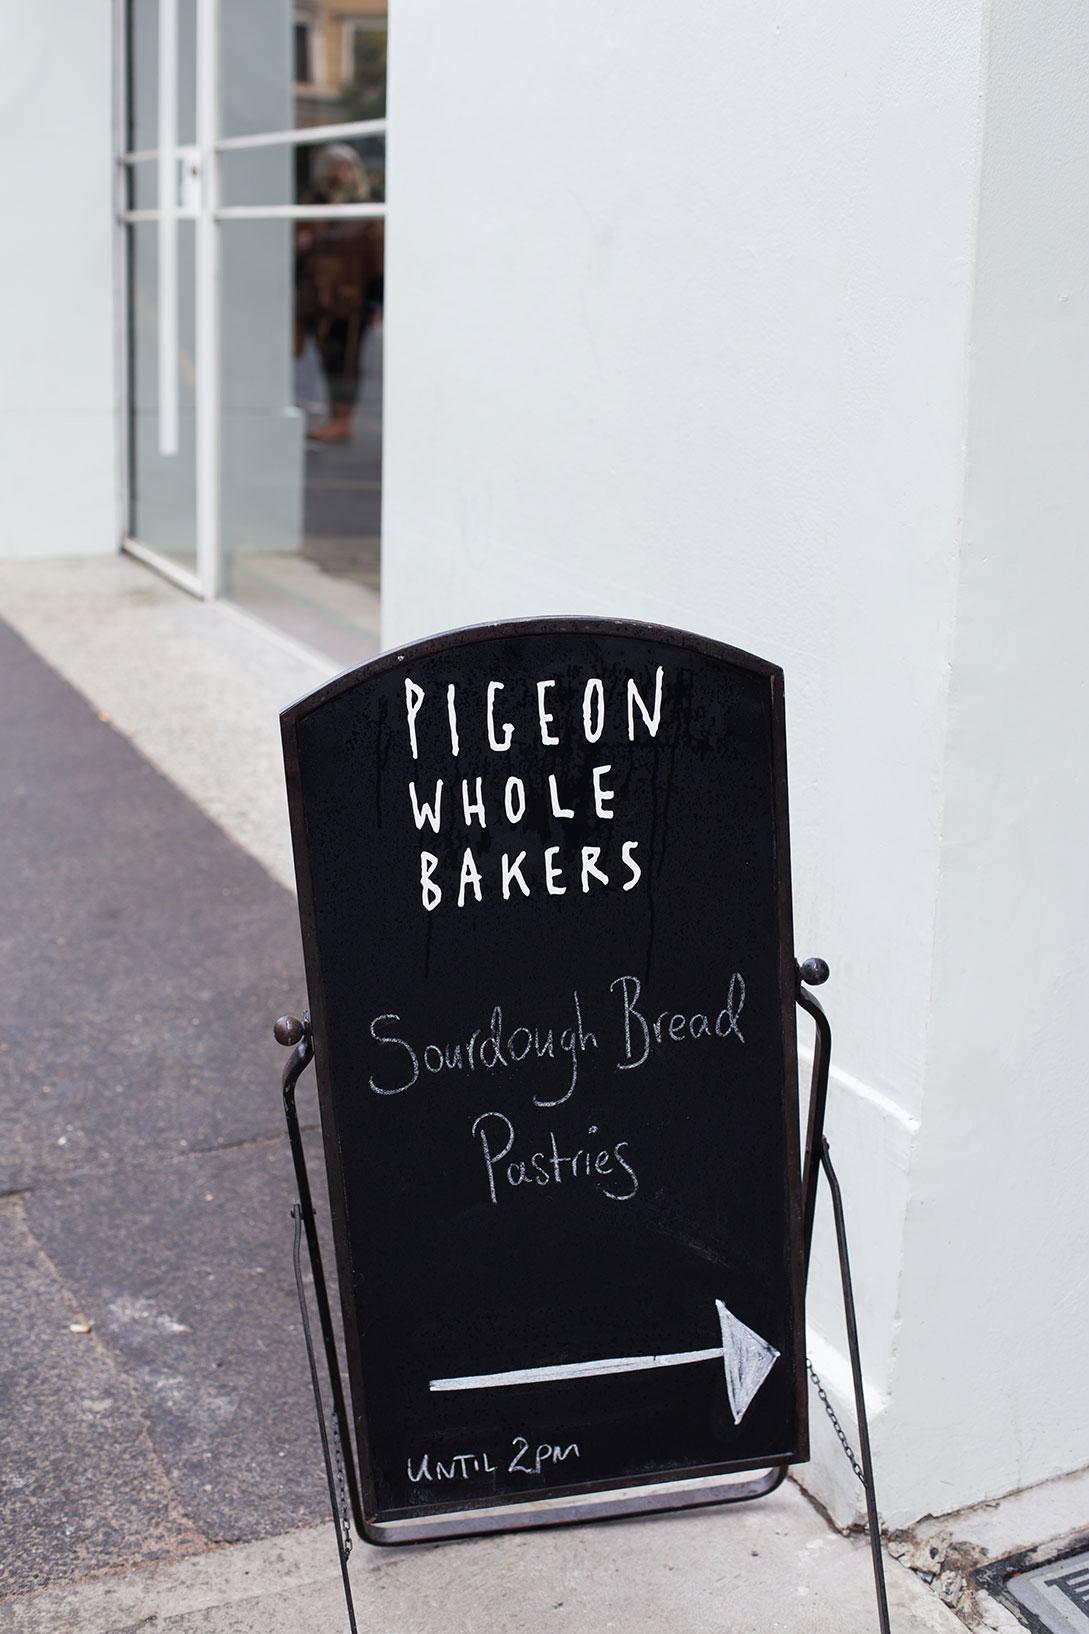 pigeon hole bakery